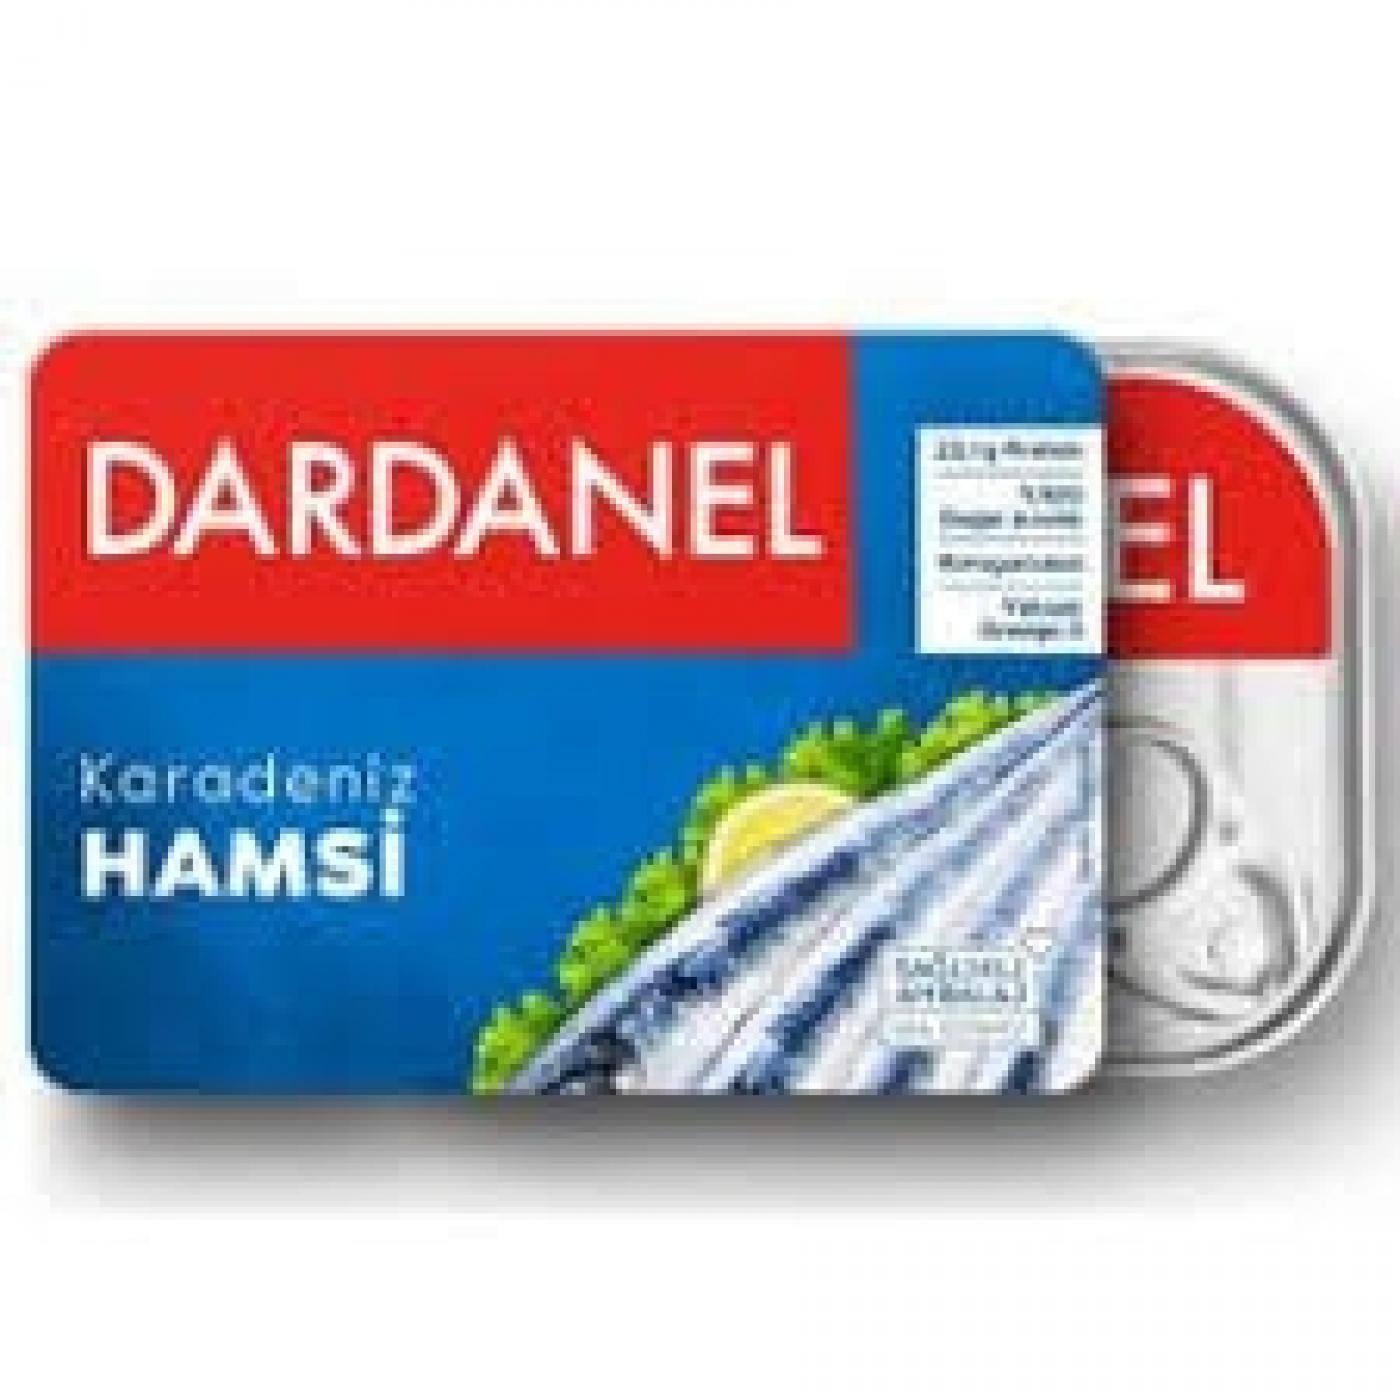 DARDANEL 100GR HAMSİ